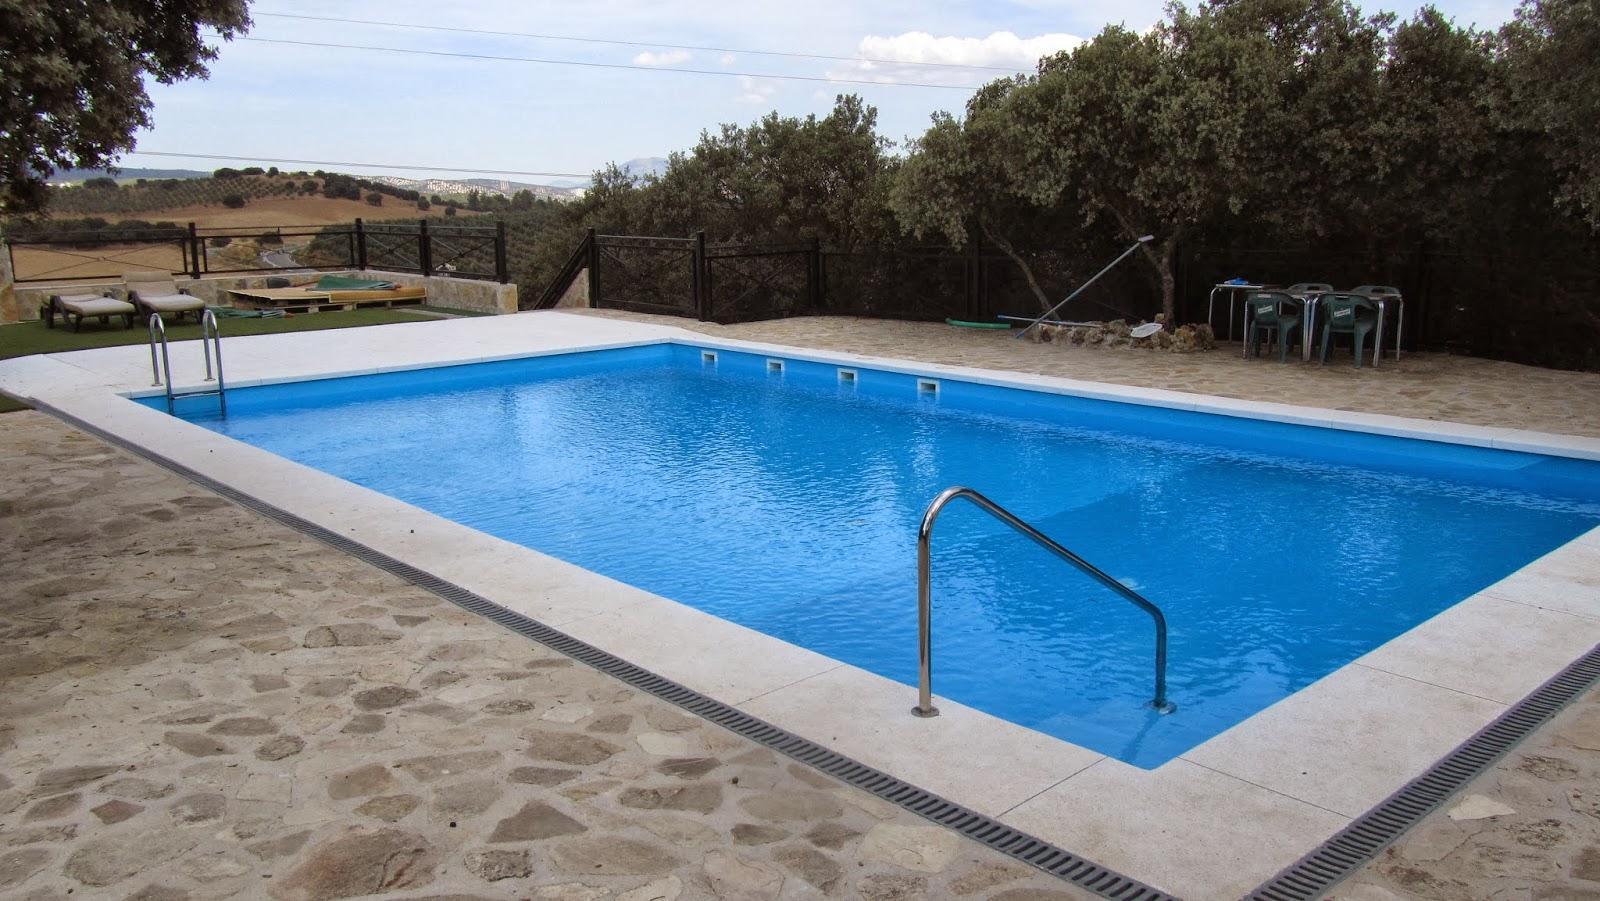 Casa rural villabuona nuestra fant stica piscina de agua for Piscina agua salada